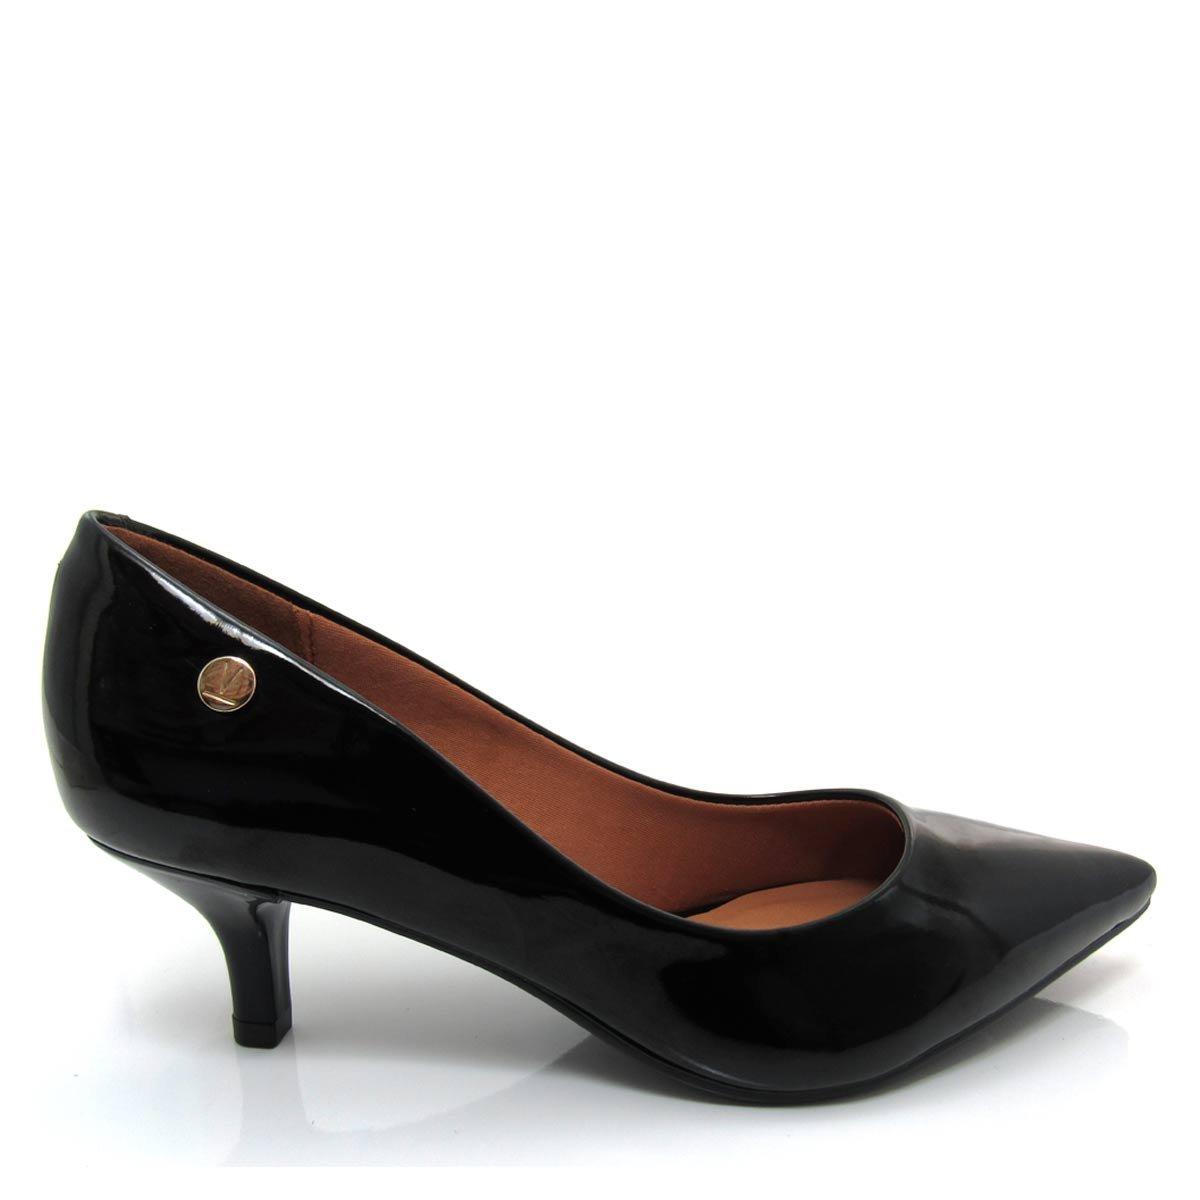 fd5c3d29a0 Sapato Scarpin Feminino Vizzano Bico fino 1122628 Salto Baixo Coleção 2018